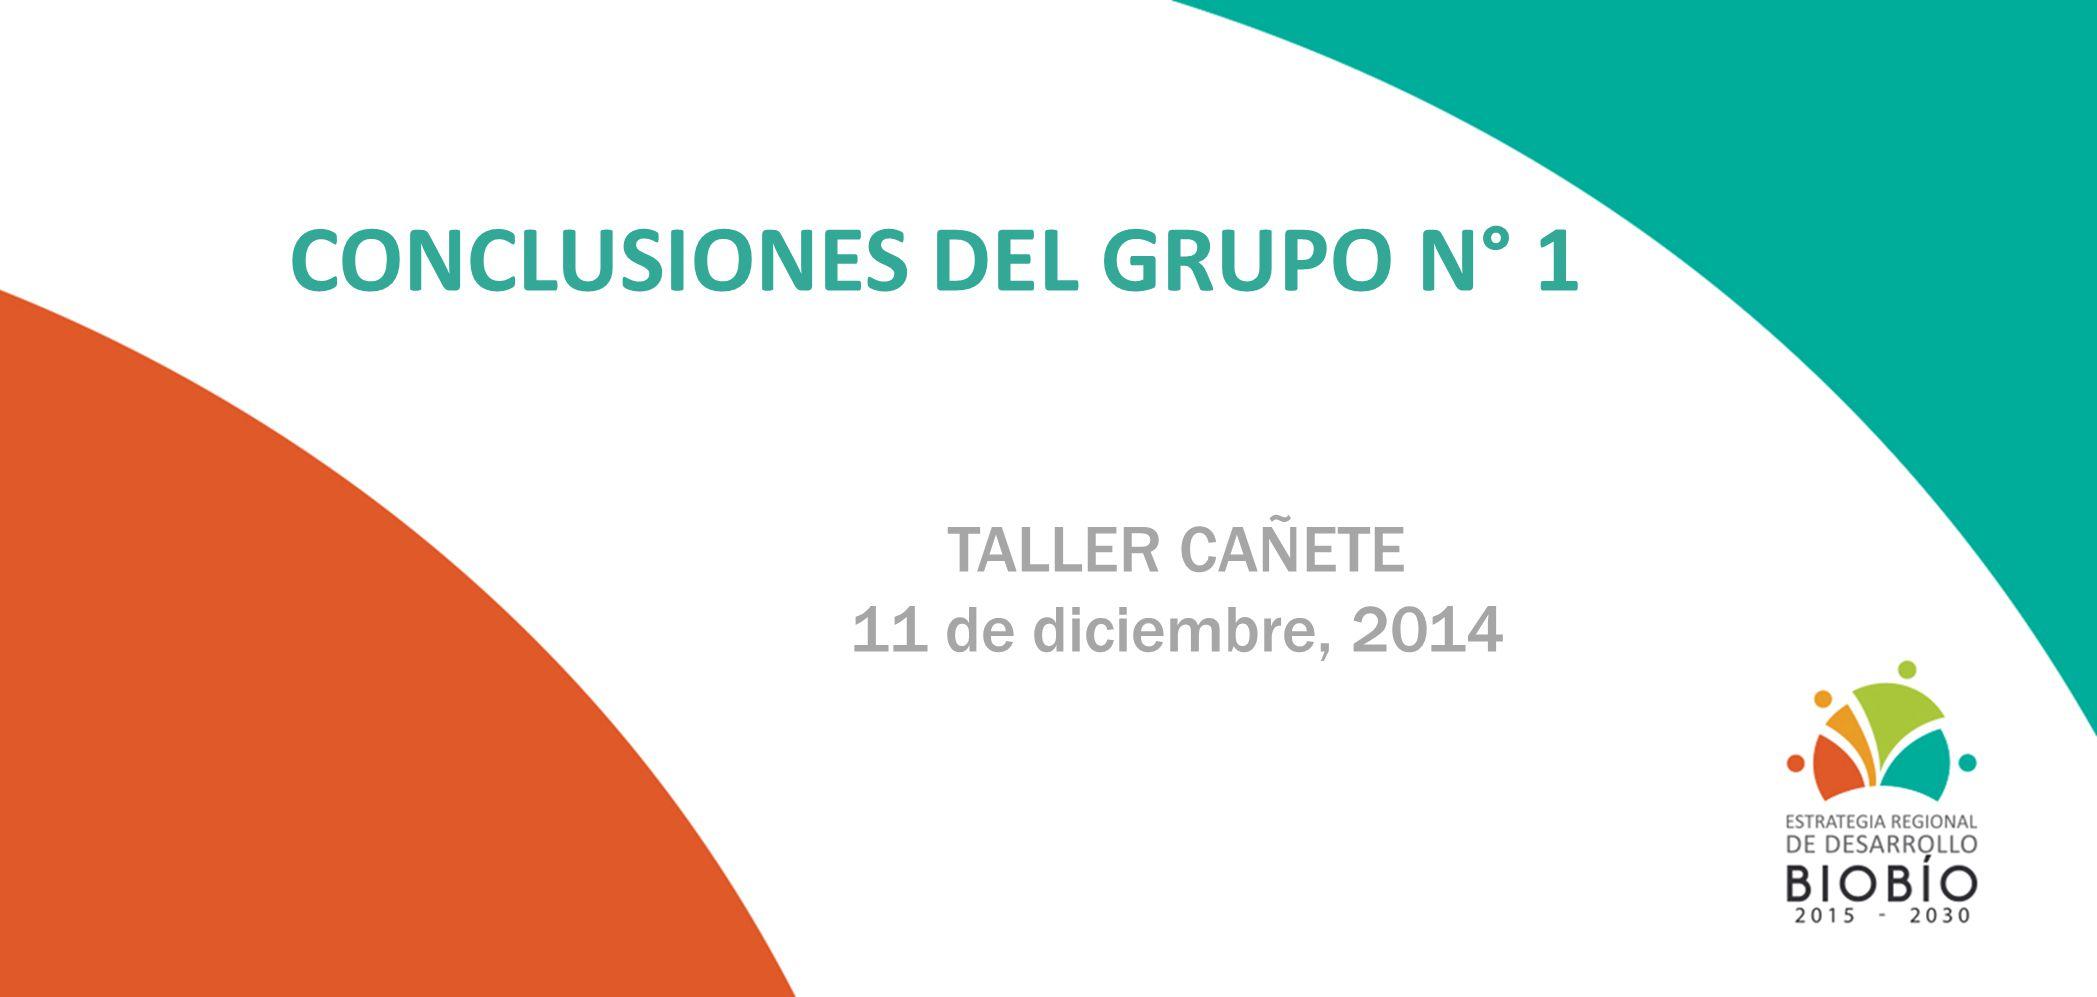 CONCLUSIONES DEL GRUPO N° 1 TALLER CAÑETE 11 de diciembre, 2014